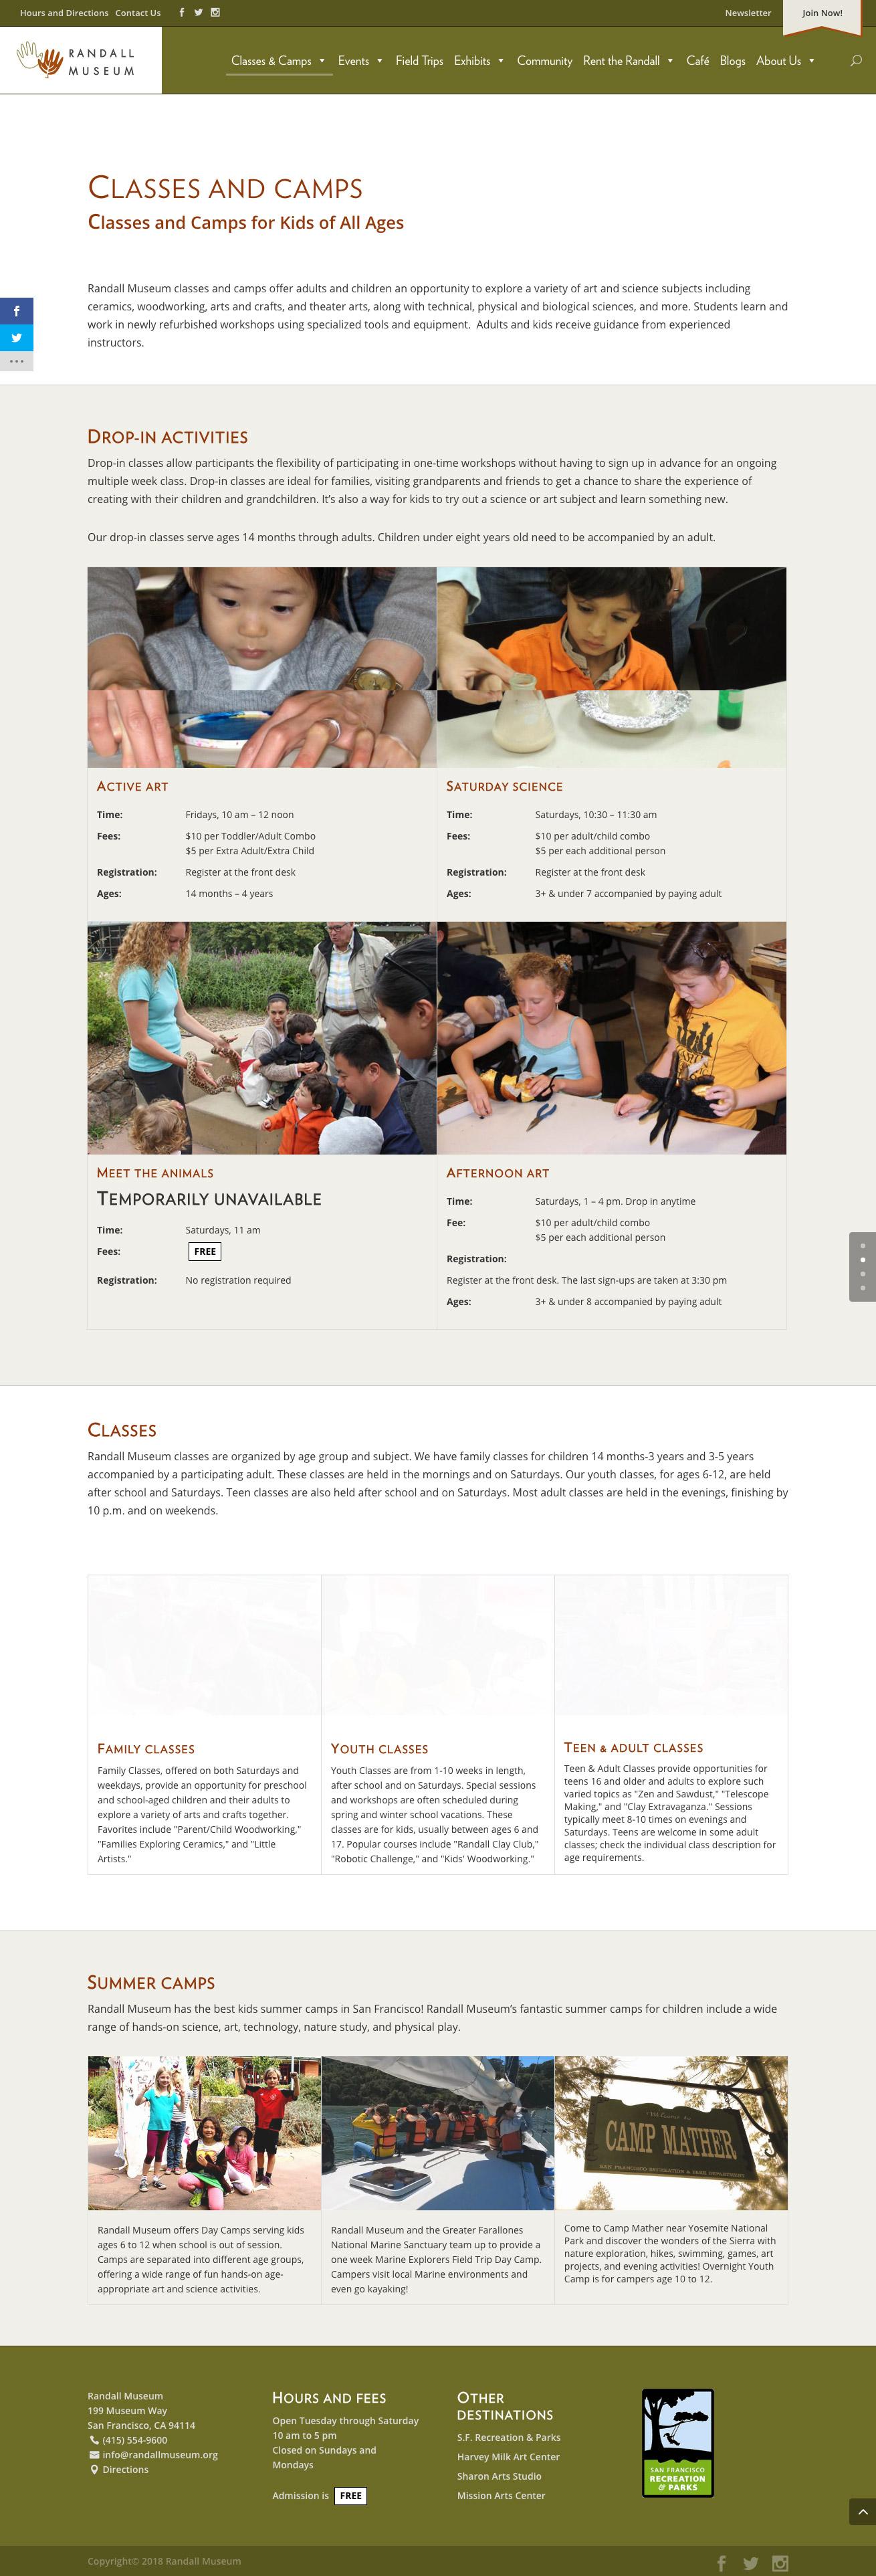 randallmuseum-org-classes